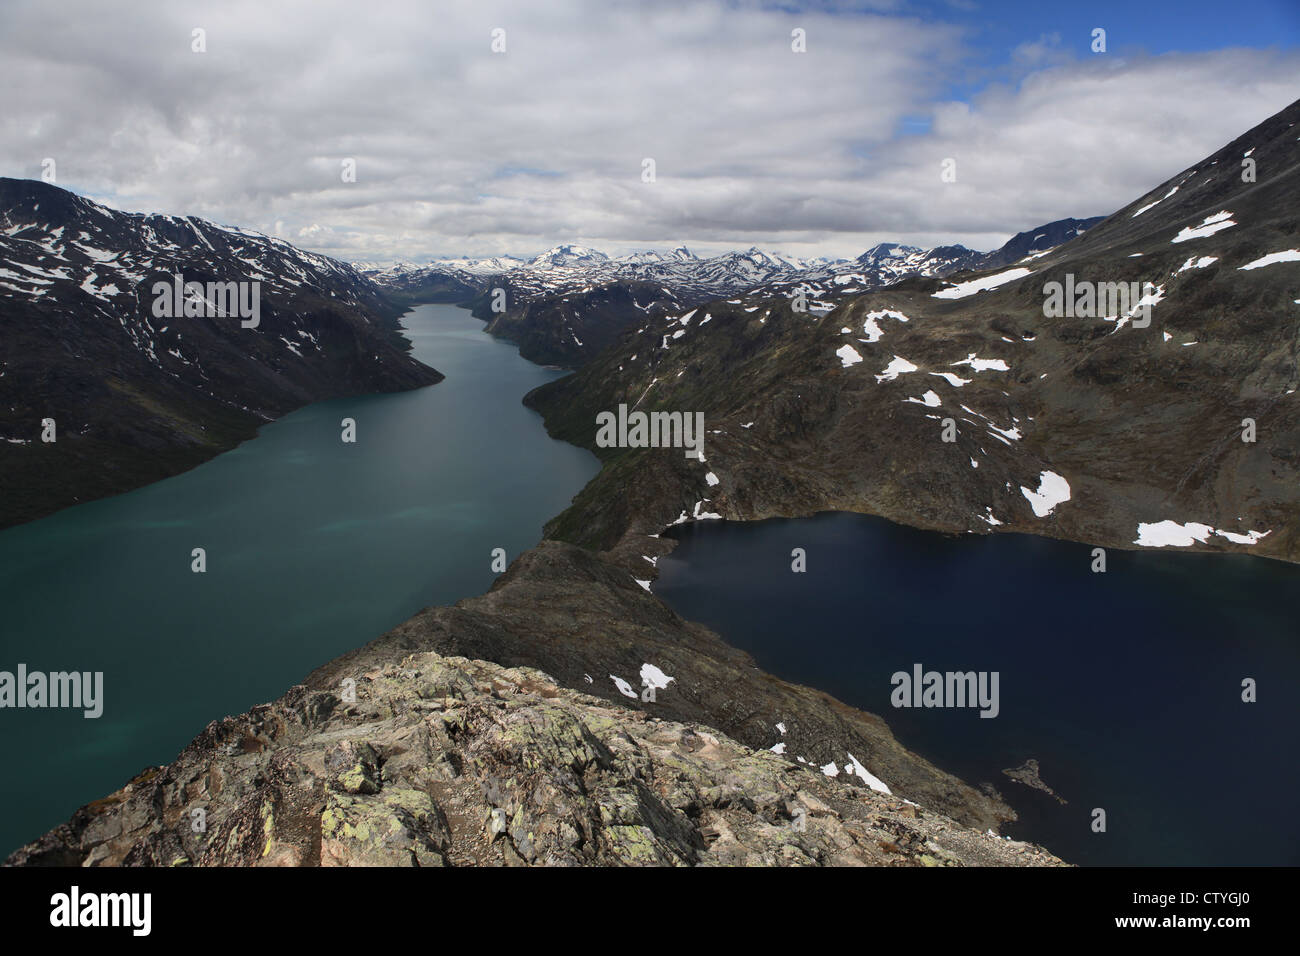 Famous Besseggen ridge in Jotunheimen - Stock Image